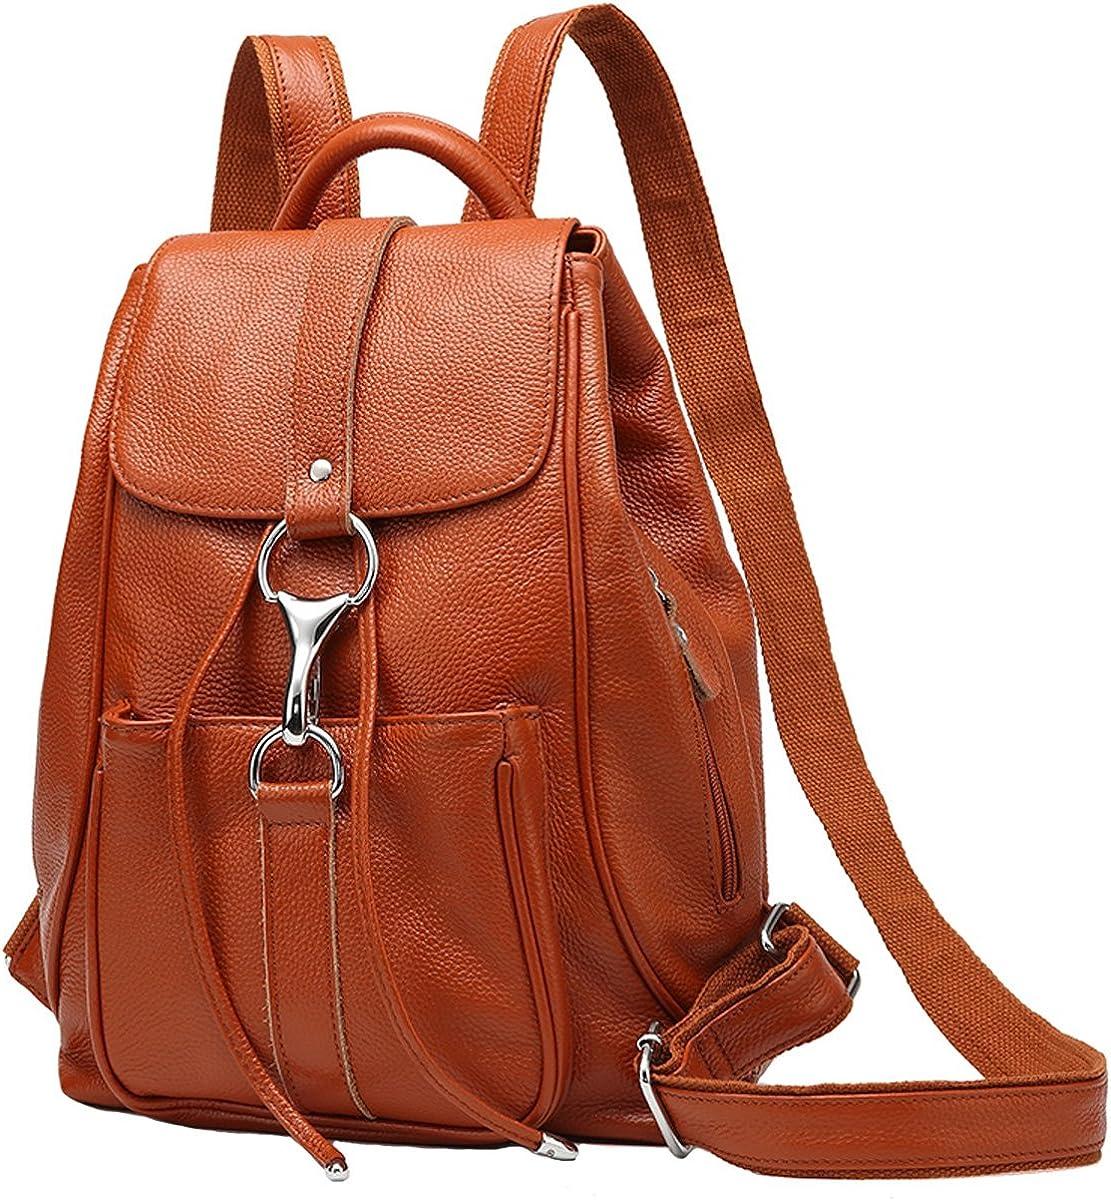 TUBACKPACK Soft Genuine Leather Backpack Handbags for Women's Satchel Shoulders Bag for Girls